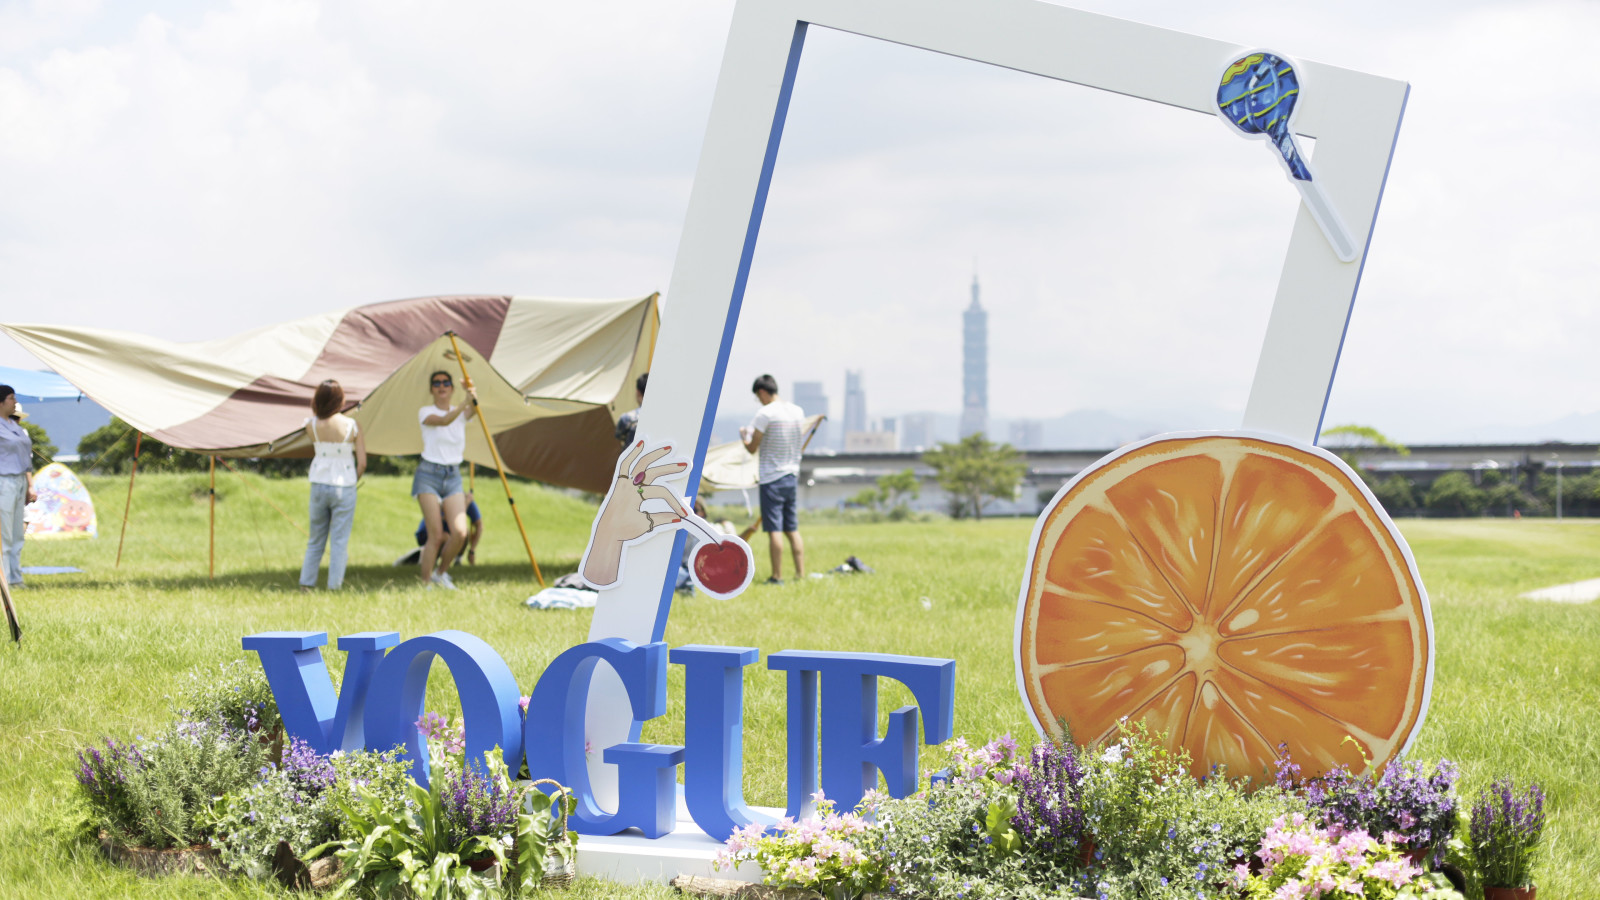 Vogue Picnic 4 - giles.heasman(何家樂) - Taiwan - Vogue Picnic